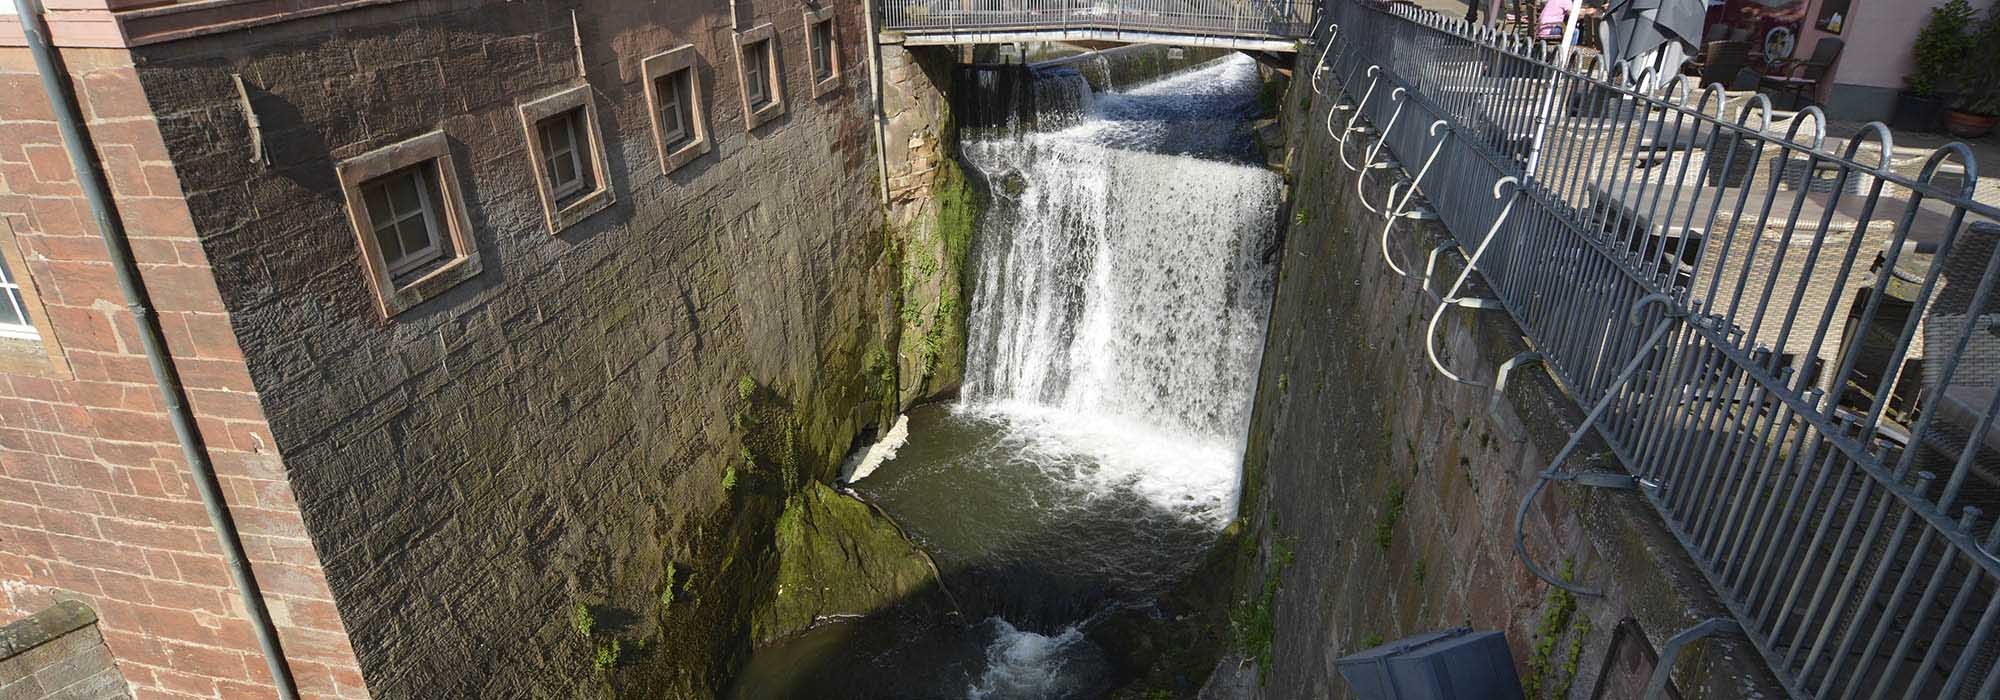 _ARN1264-Saarburg-Wasserfall